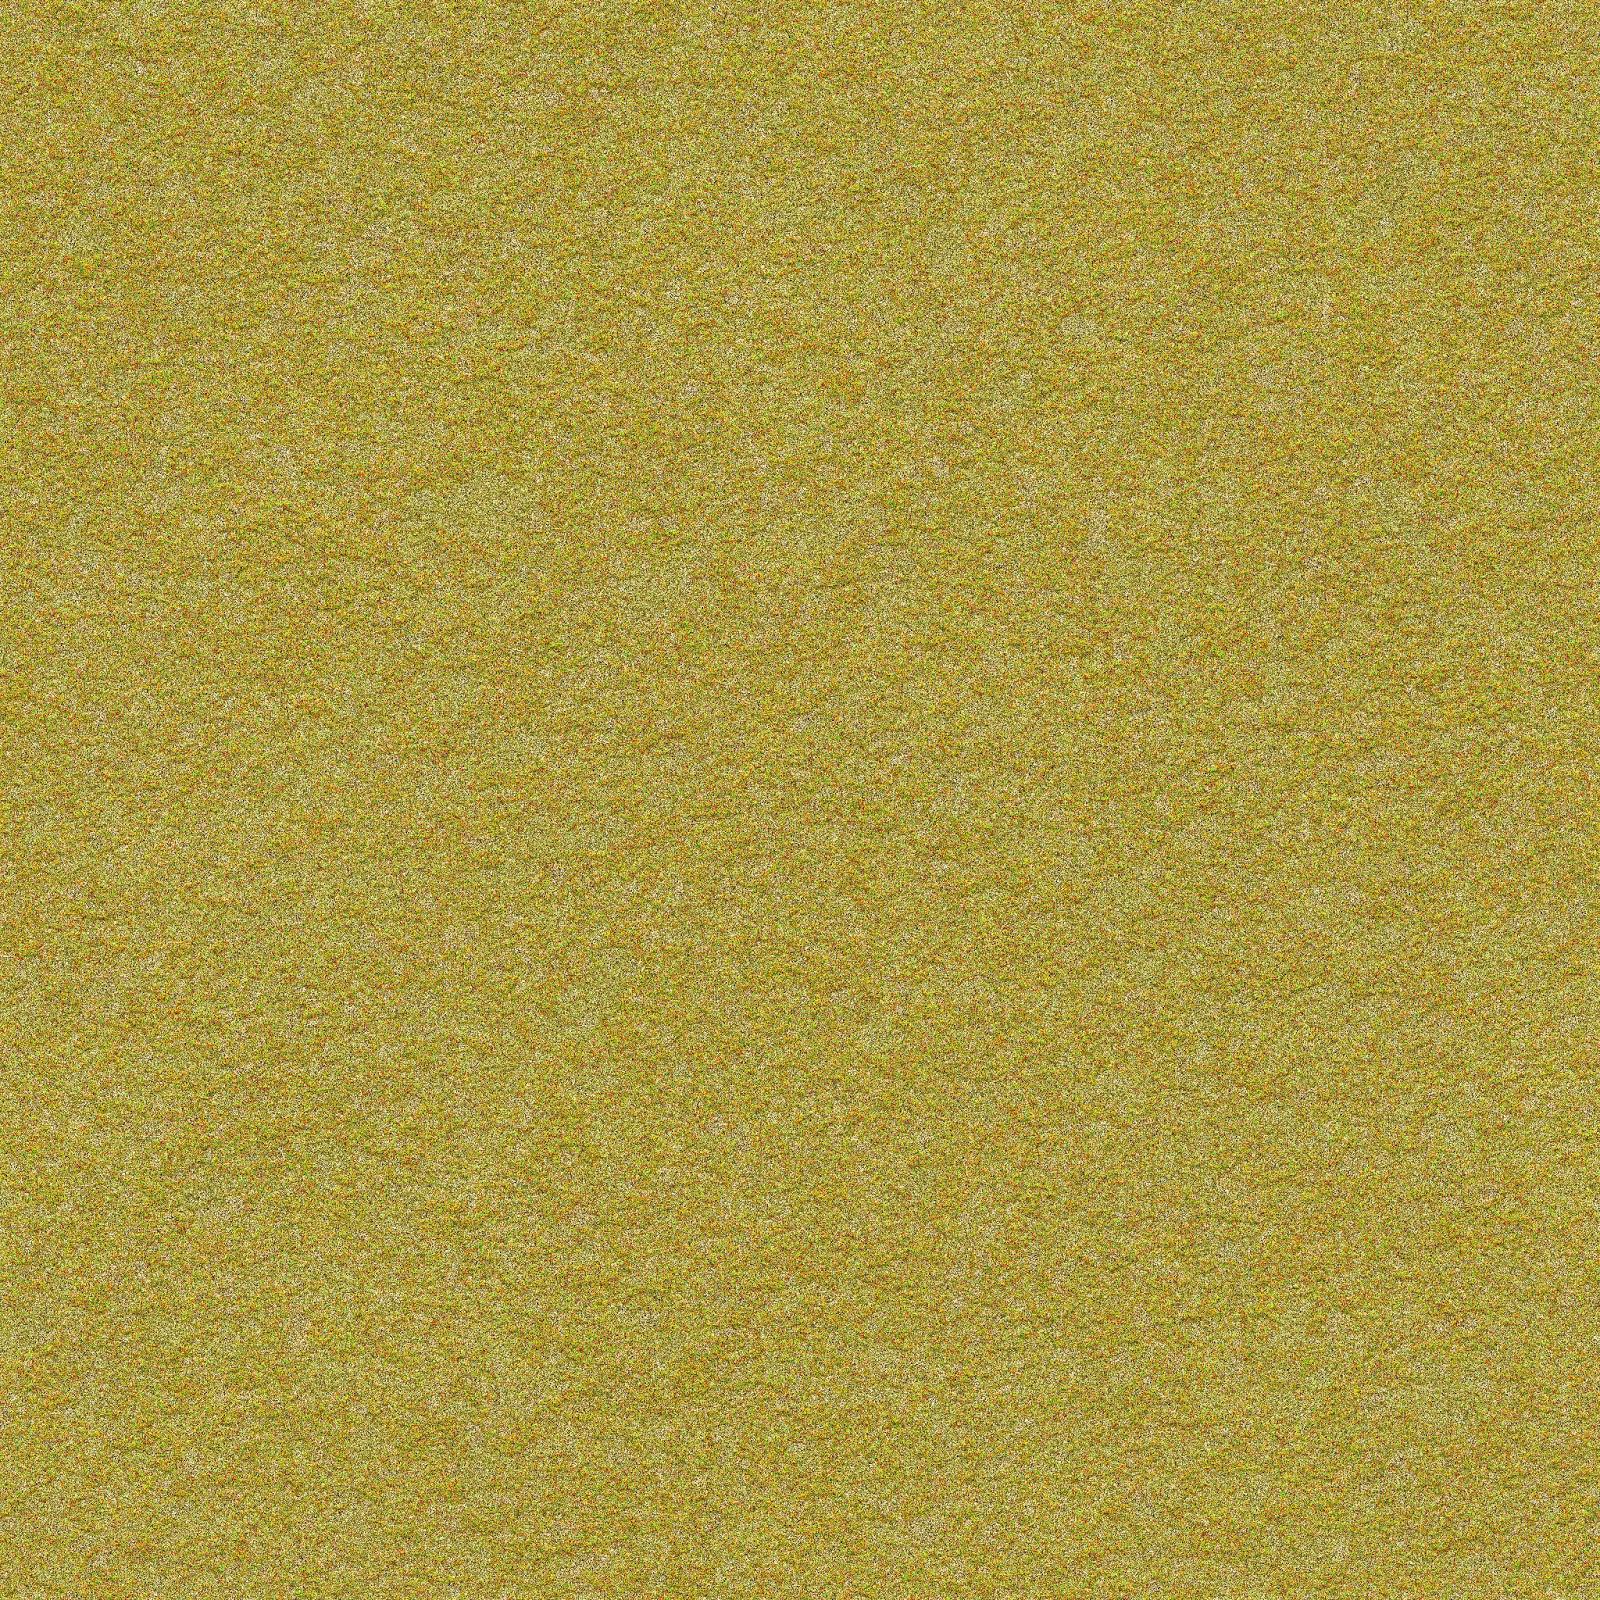 Dry_patch_grass_ground_land_dirt_aerial_top_seamless_texture